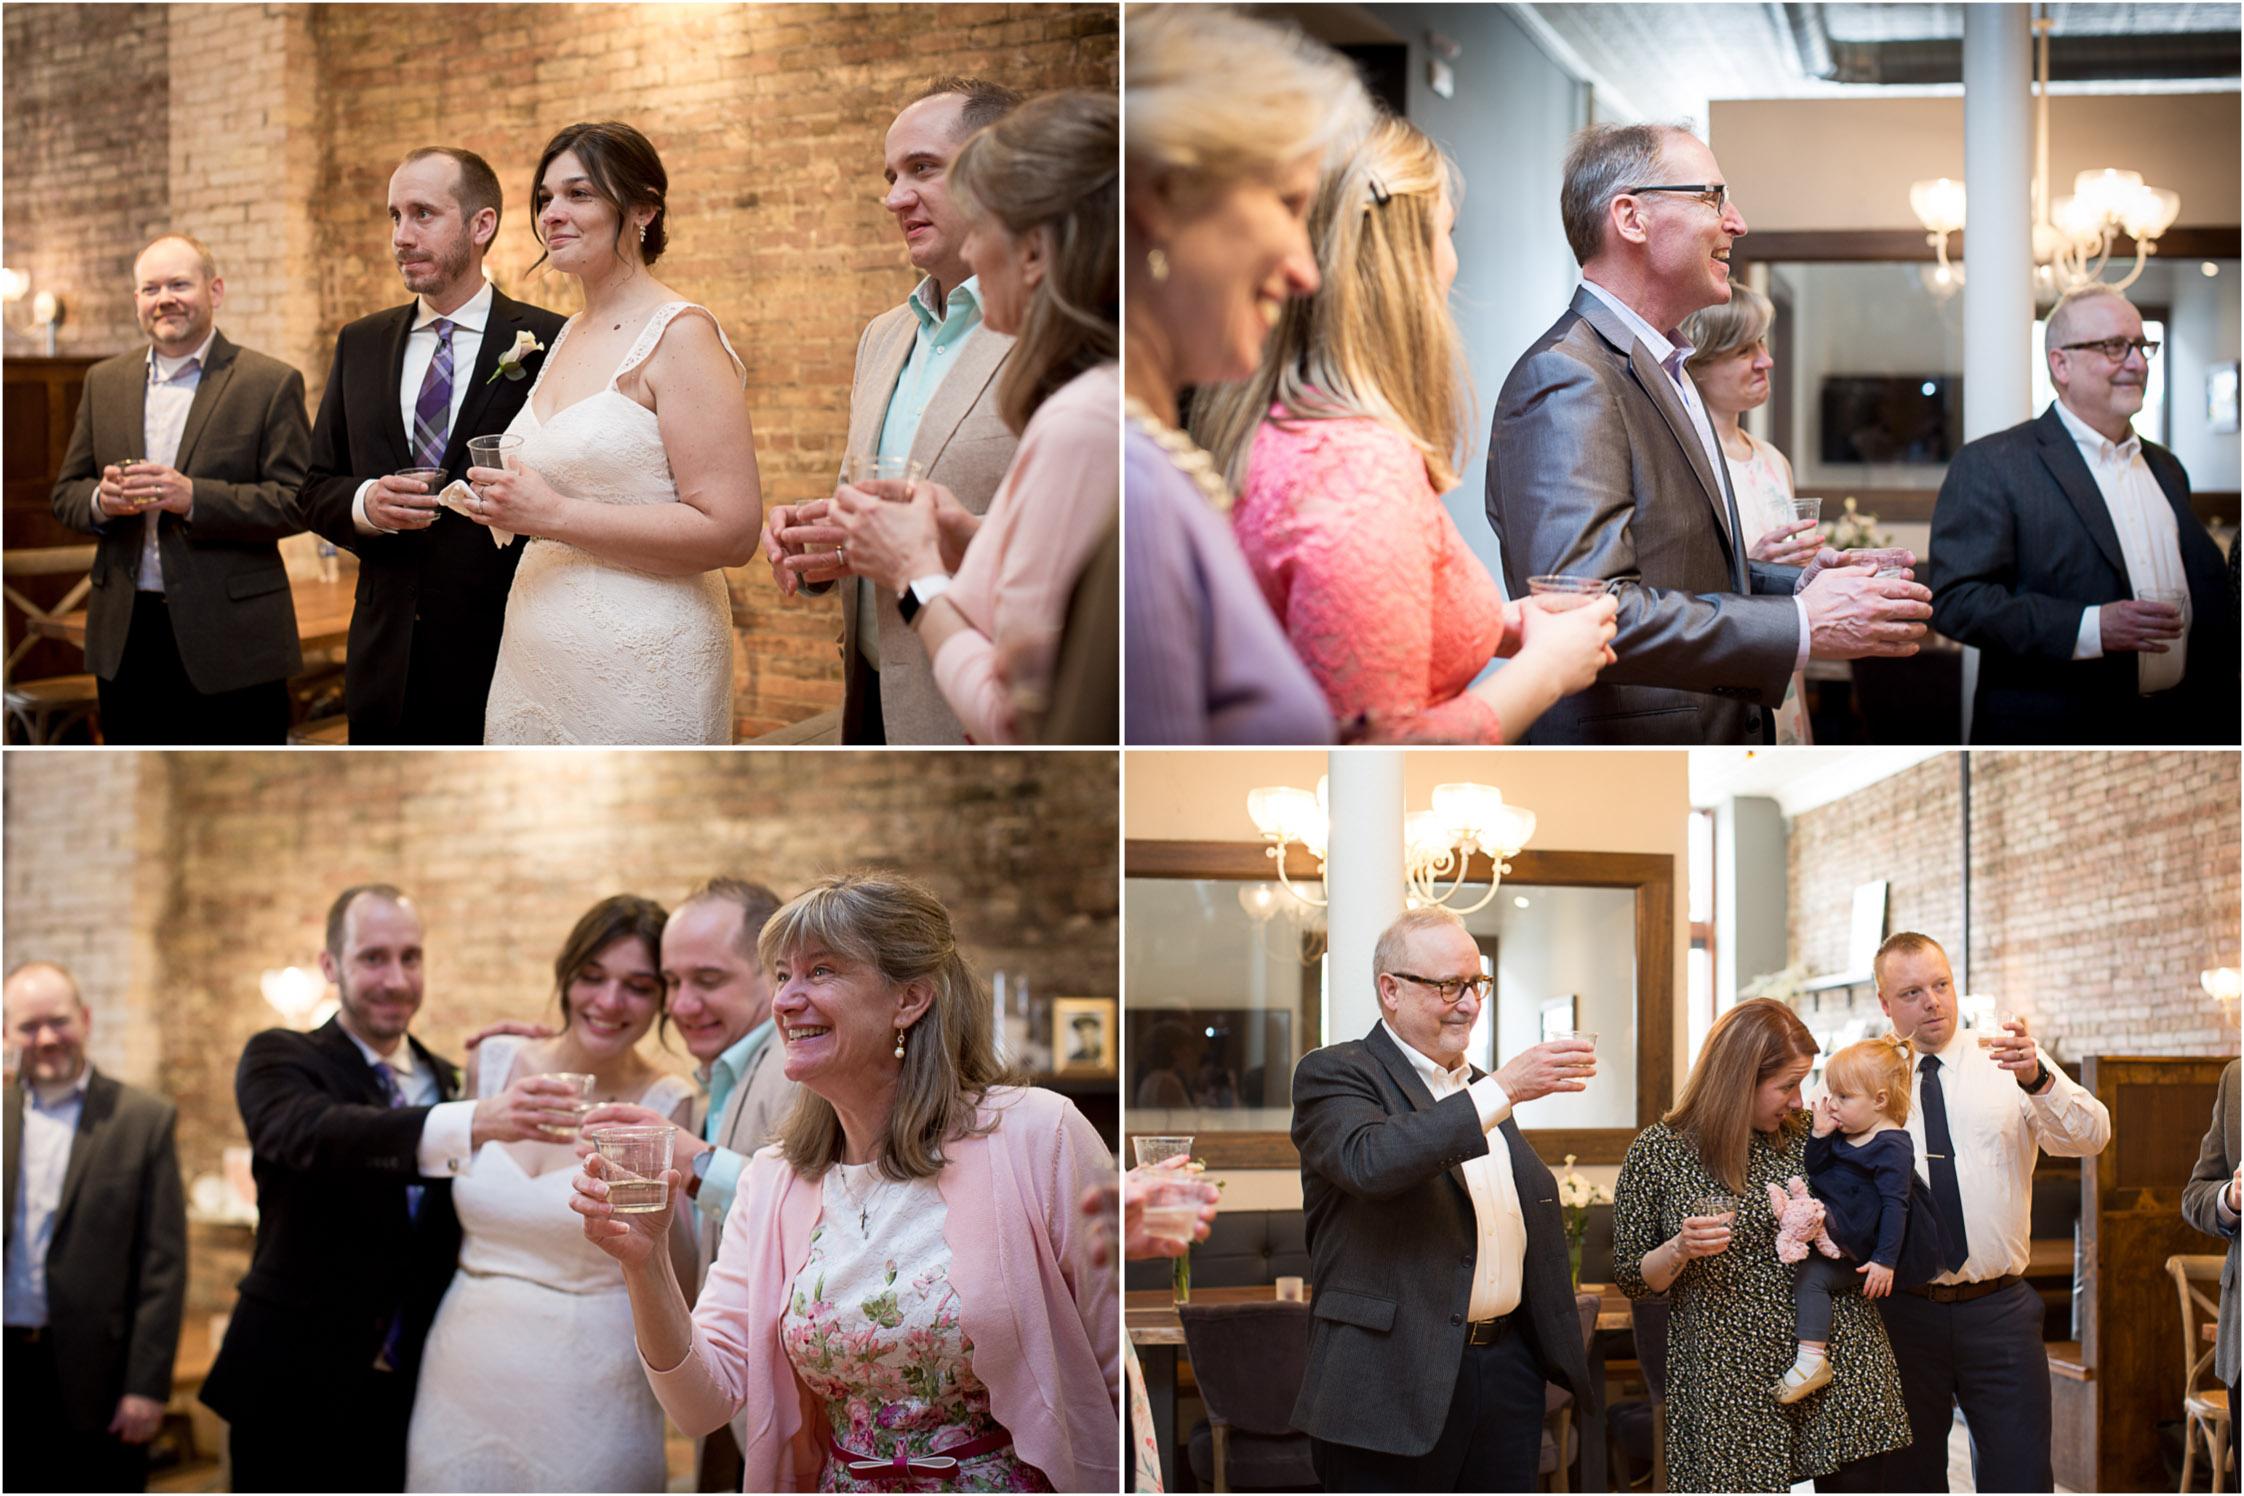 14-cornerstone-studios-wedding-professionals-small-events-reception-toast-mahonen-photography.jpg